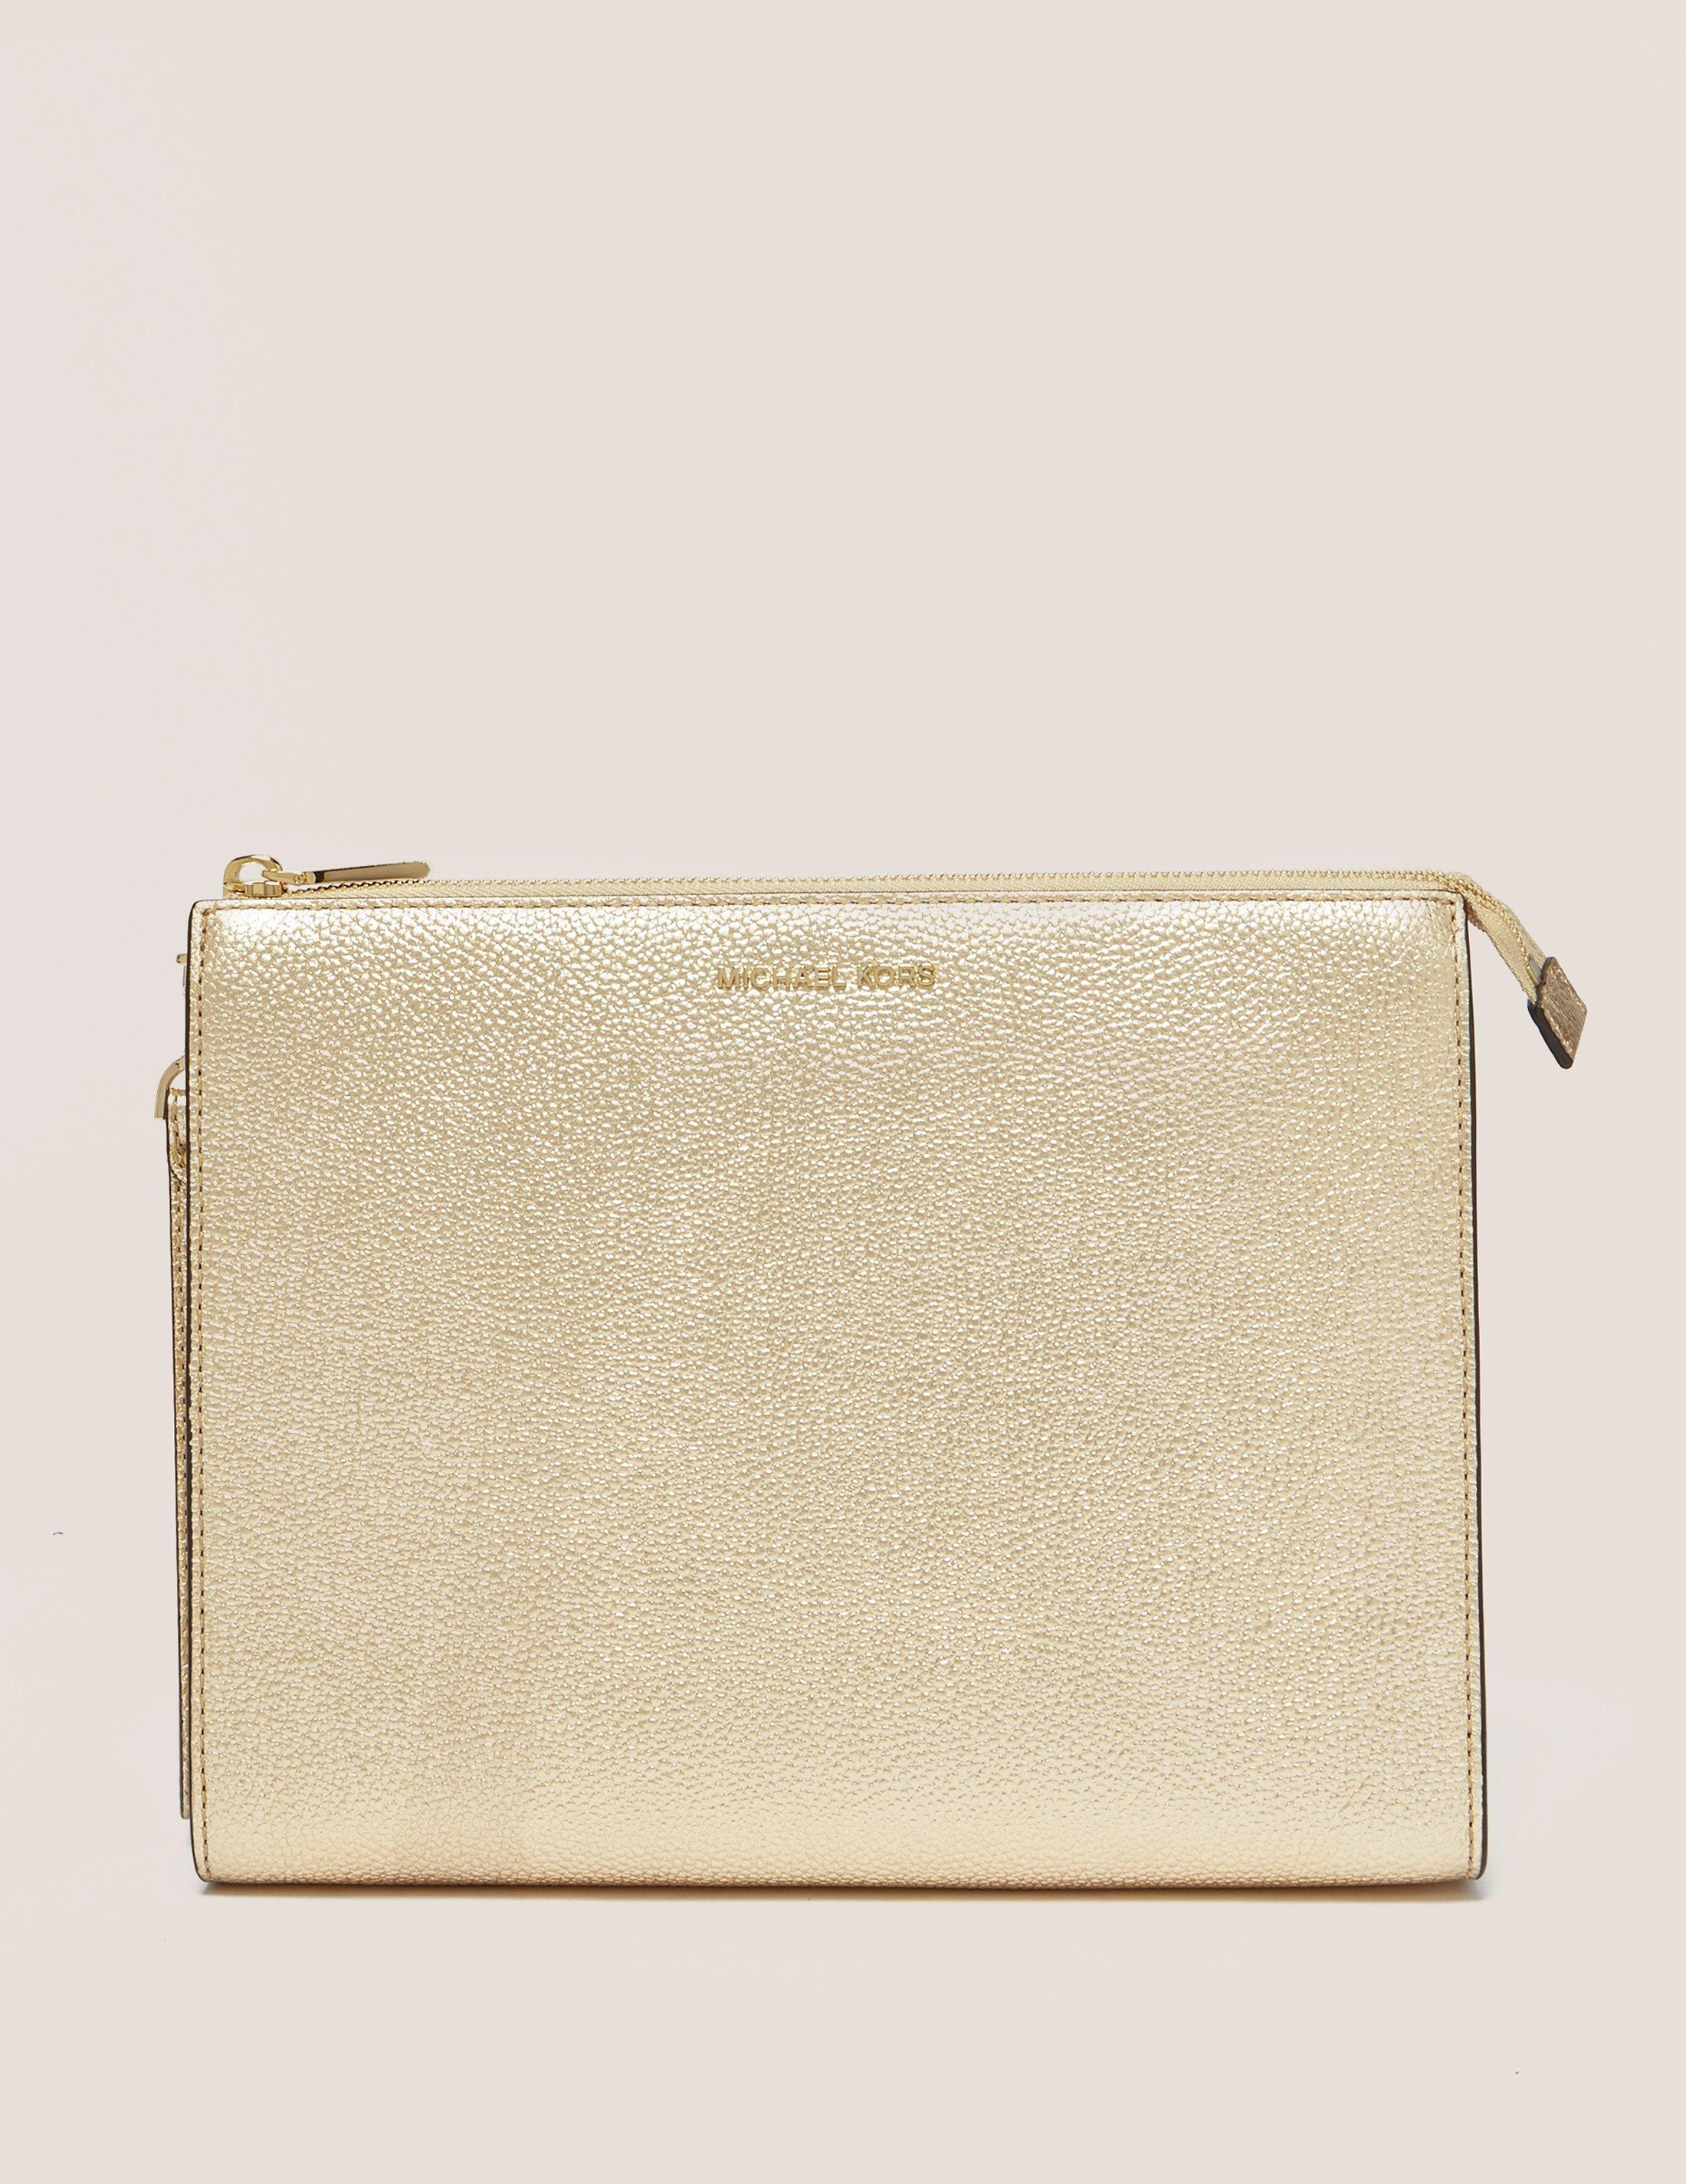 07b695079414 Michael Kors Womens Mercer Large Pouch Bag Gold in Metallic - Lyst